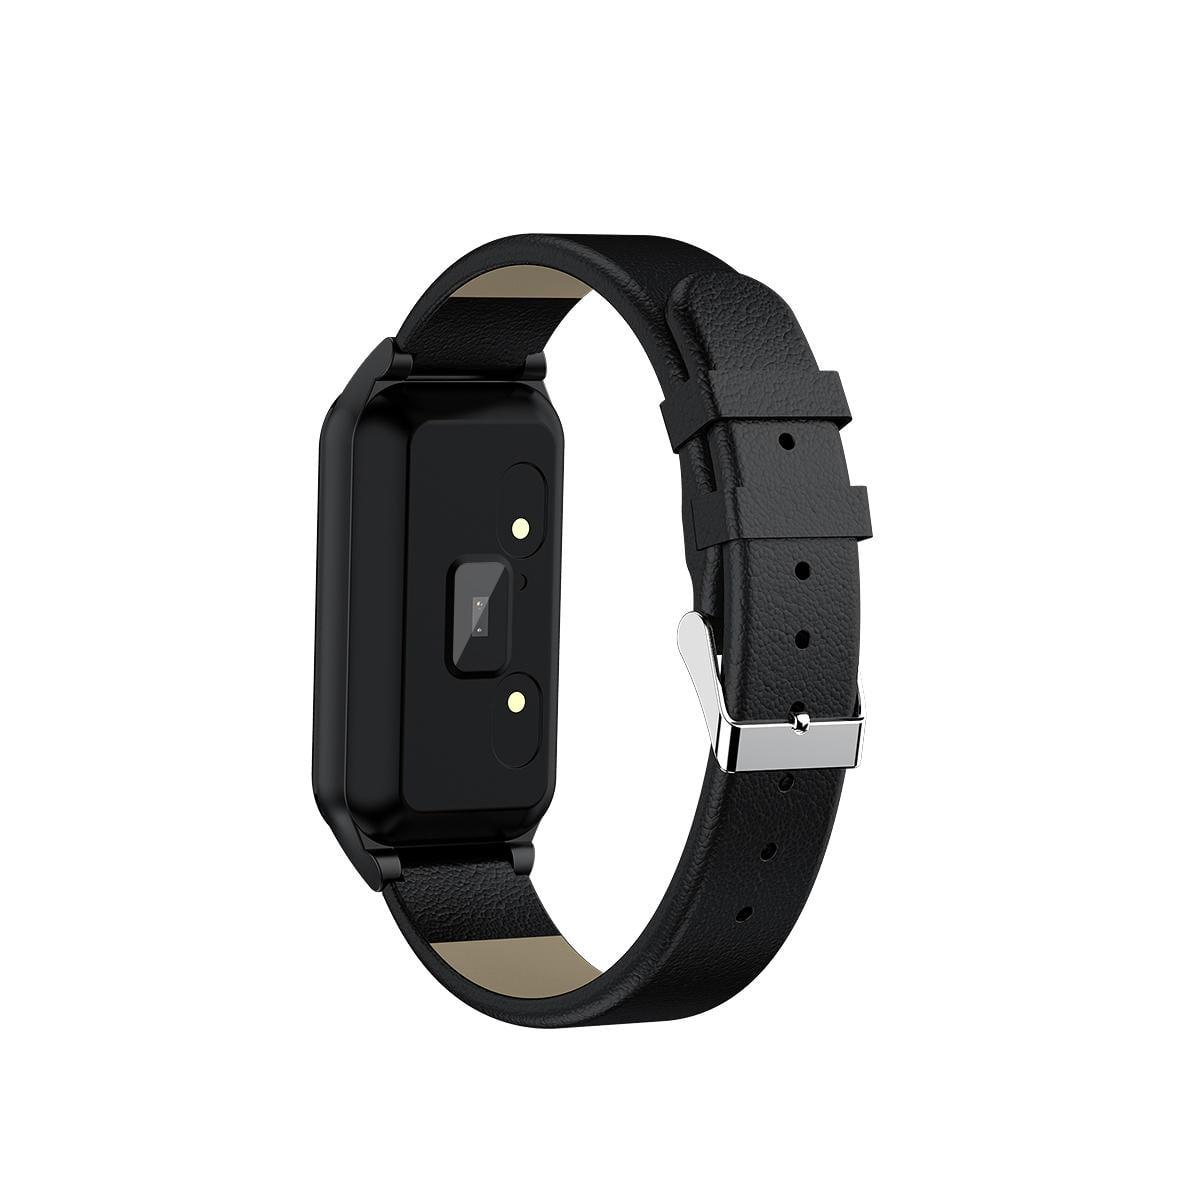 Bakeey smartwatch L818 bt5.0 intelligent noise reduction wireless earphone wristband (29)